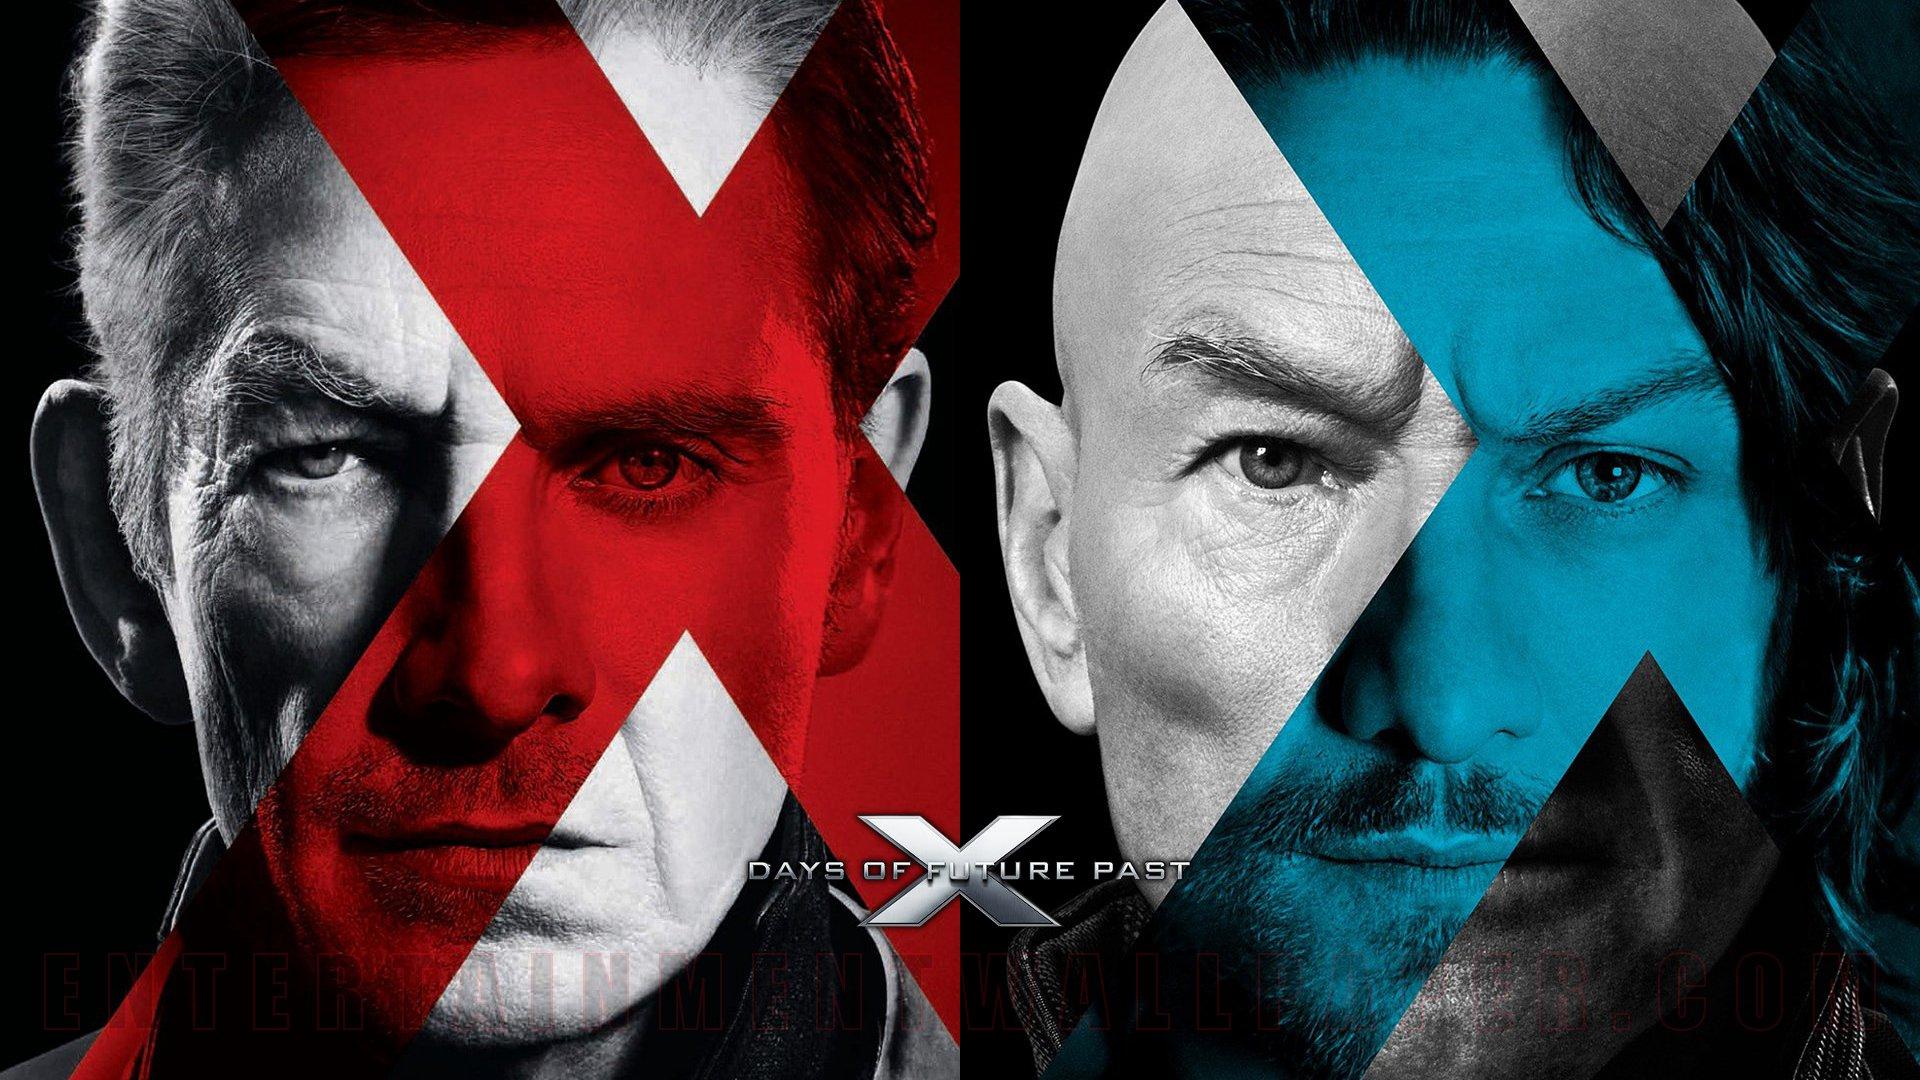 X men Days of Future Past Wallpapers   X Men Wallpaper 35921959 1920x1080